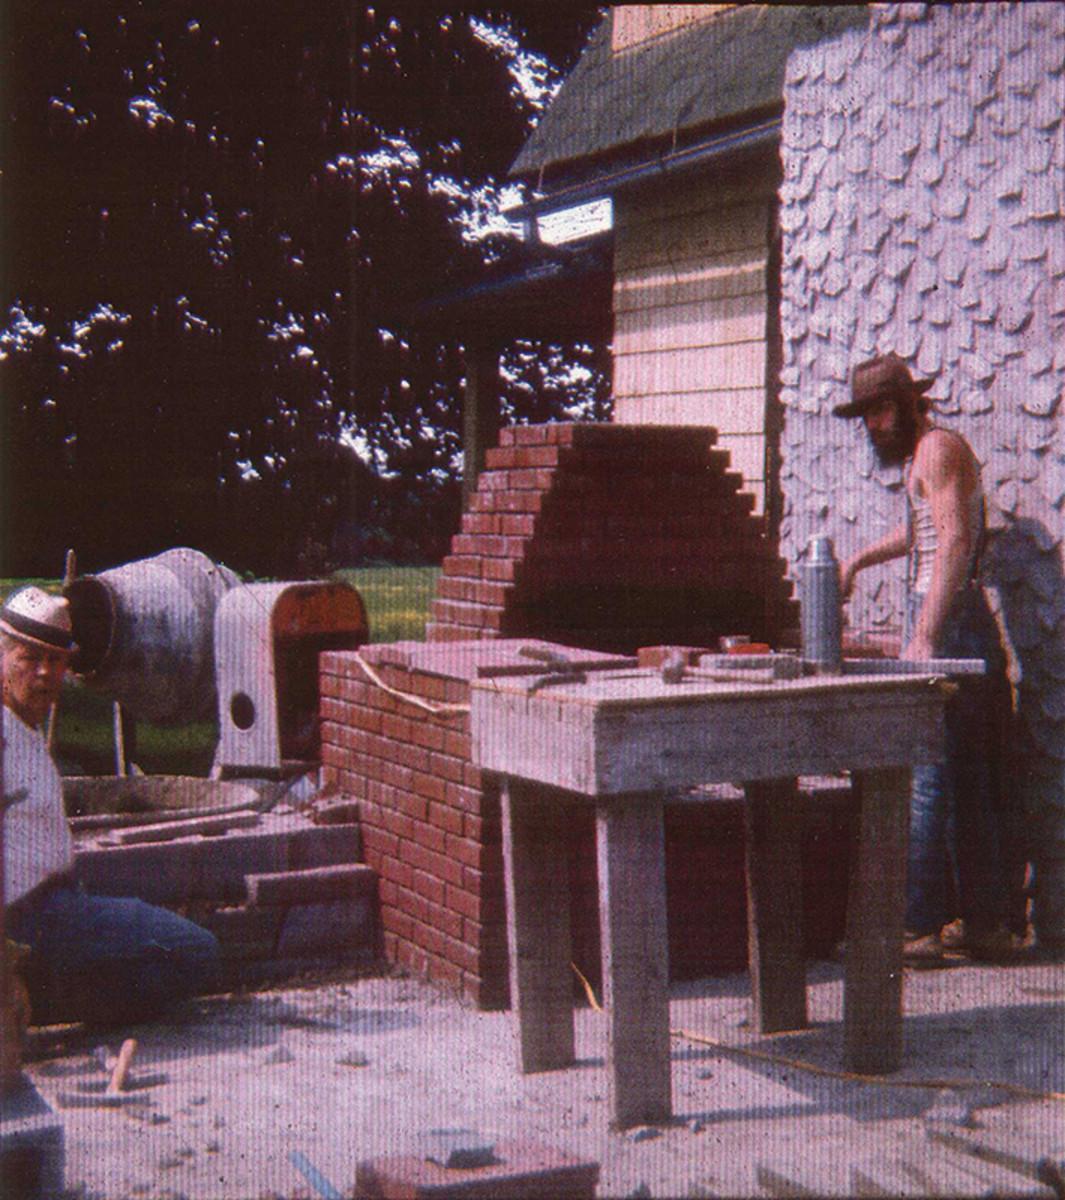 Stonemason mentor on the left, Marshall Pruitt. On the right, a younger Ken Follett.